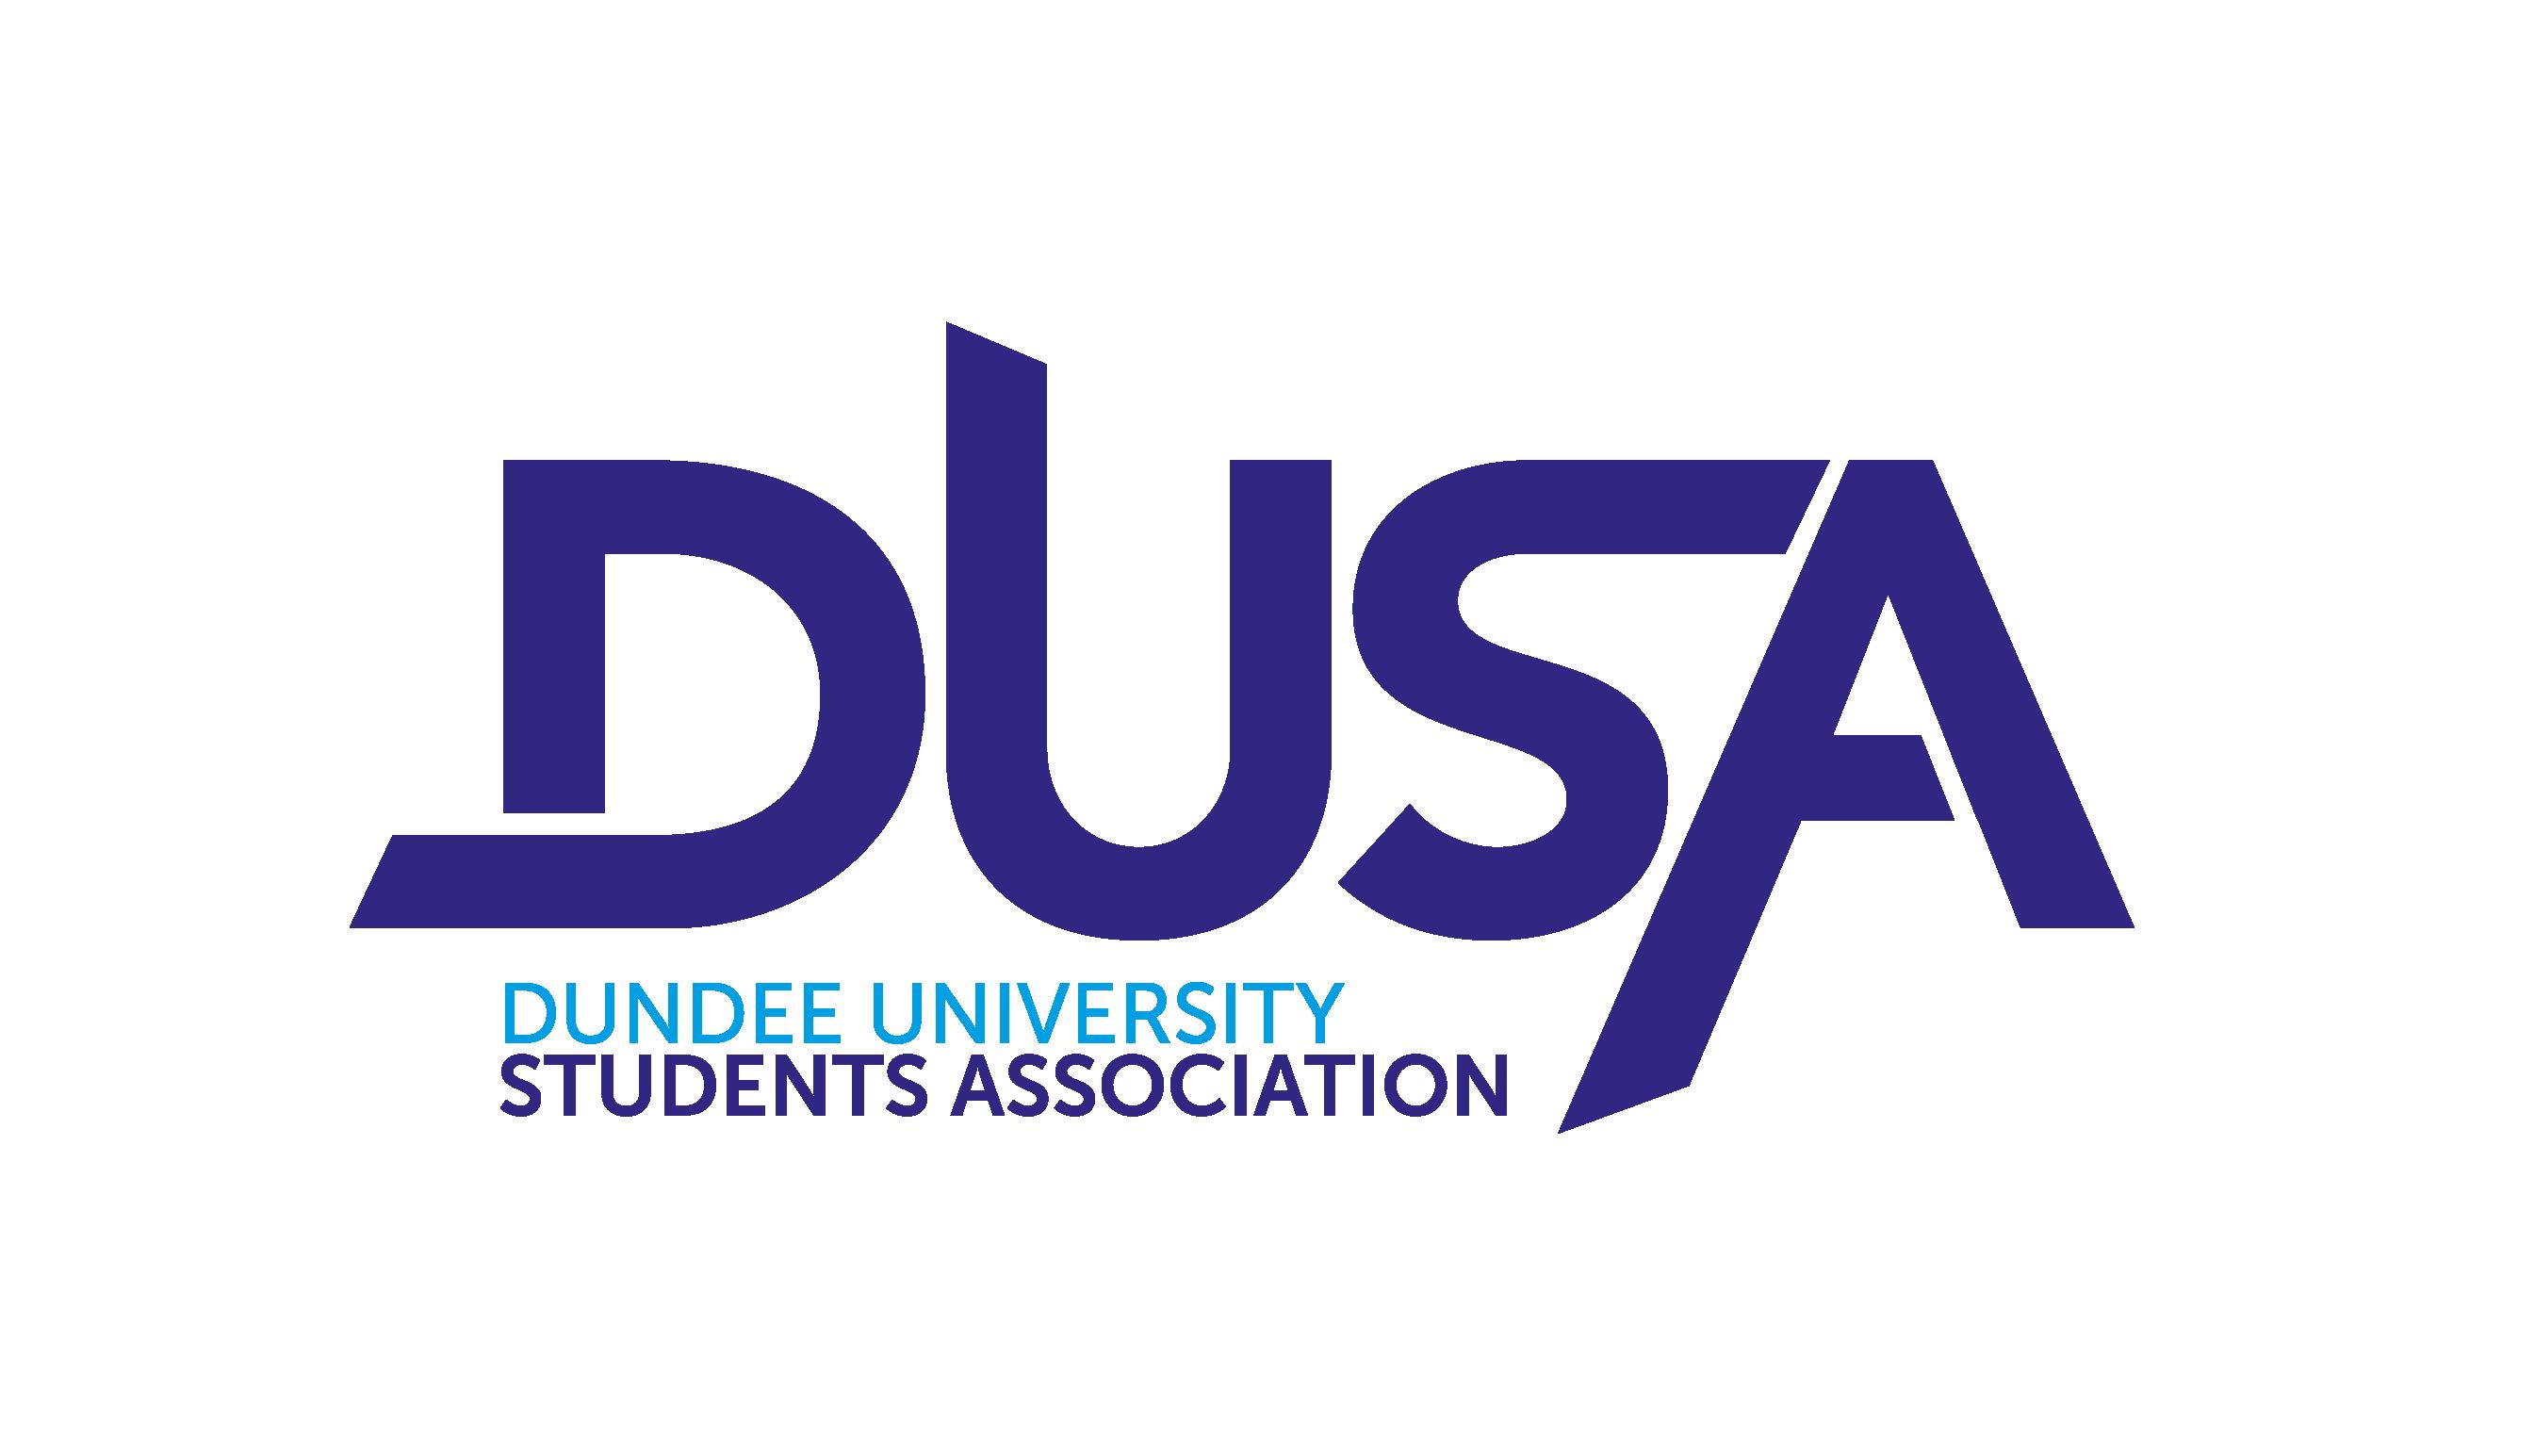 Dundee University Students